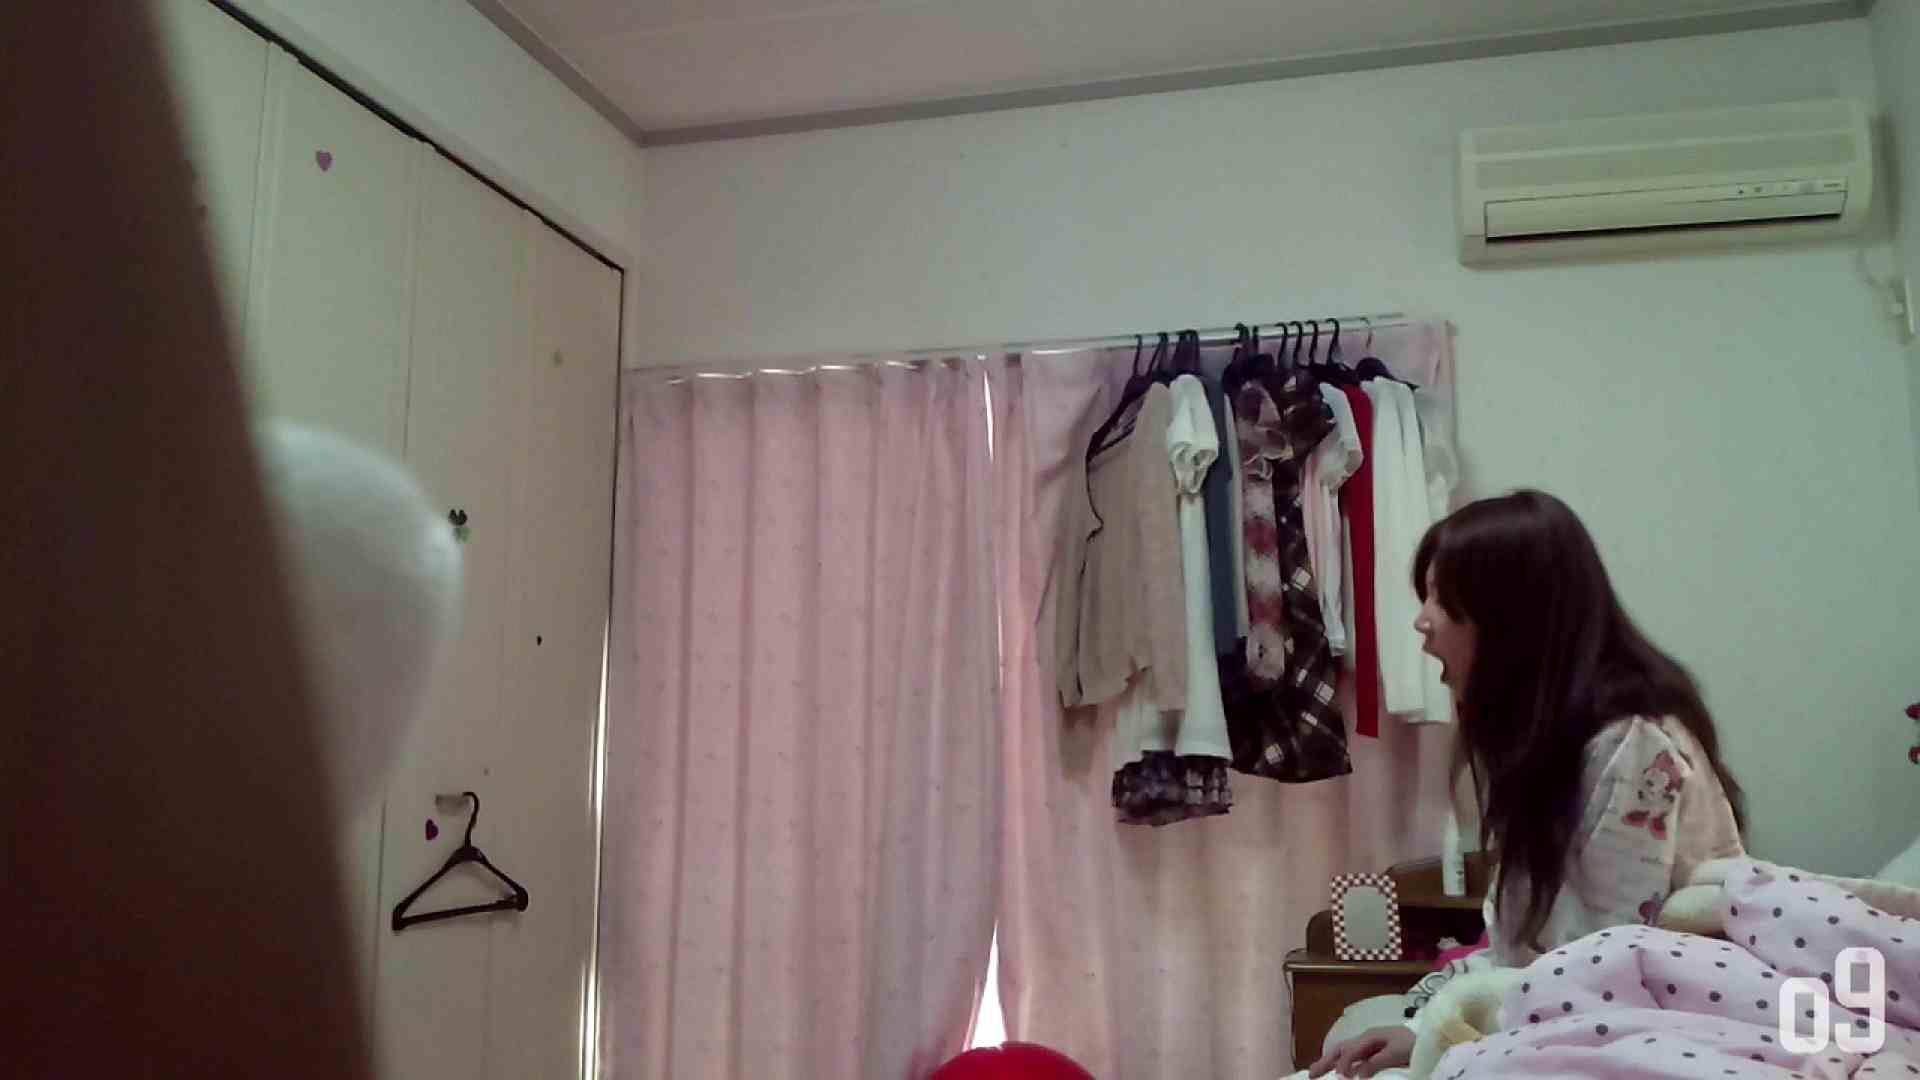 vol.2 瑞希ちゃんの自宅公開!寝起きの着替え・・・ラリルそー 着替えシーン  25連発 6